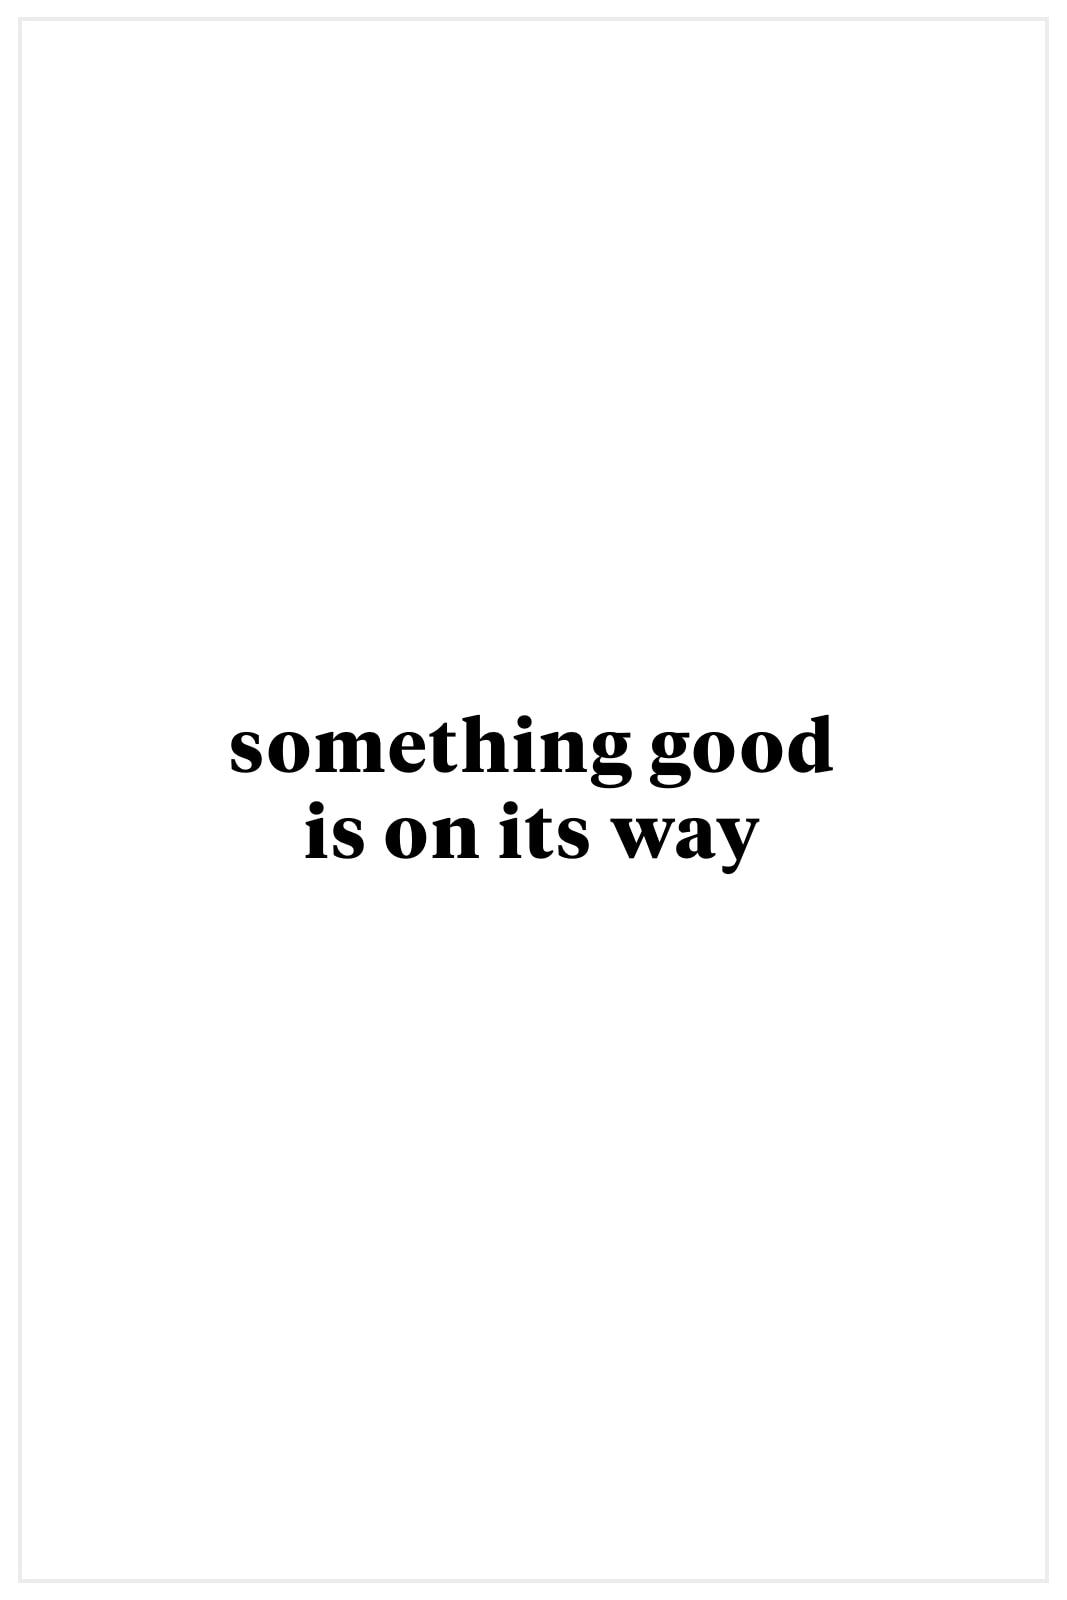 Z supply Easy Cowl Sweatshirt